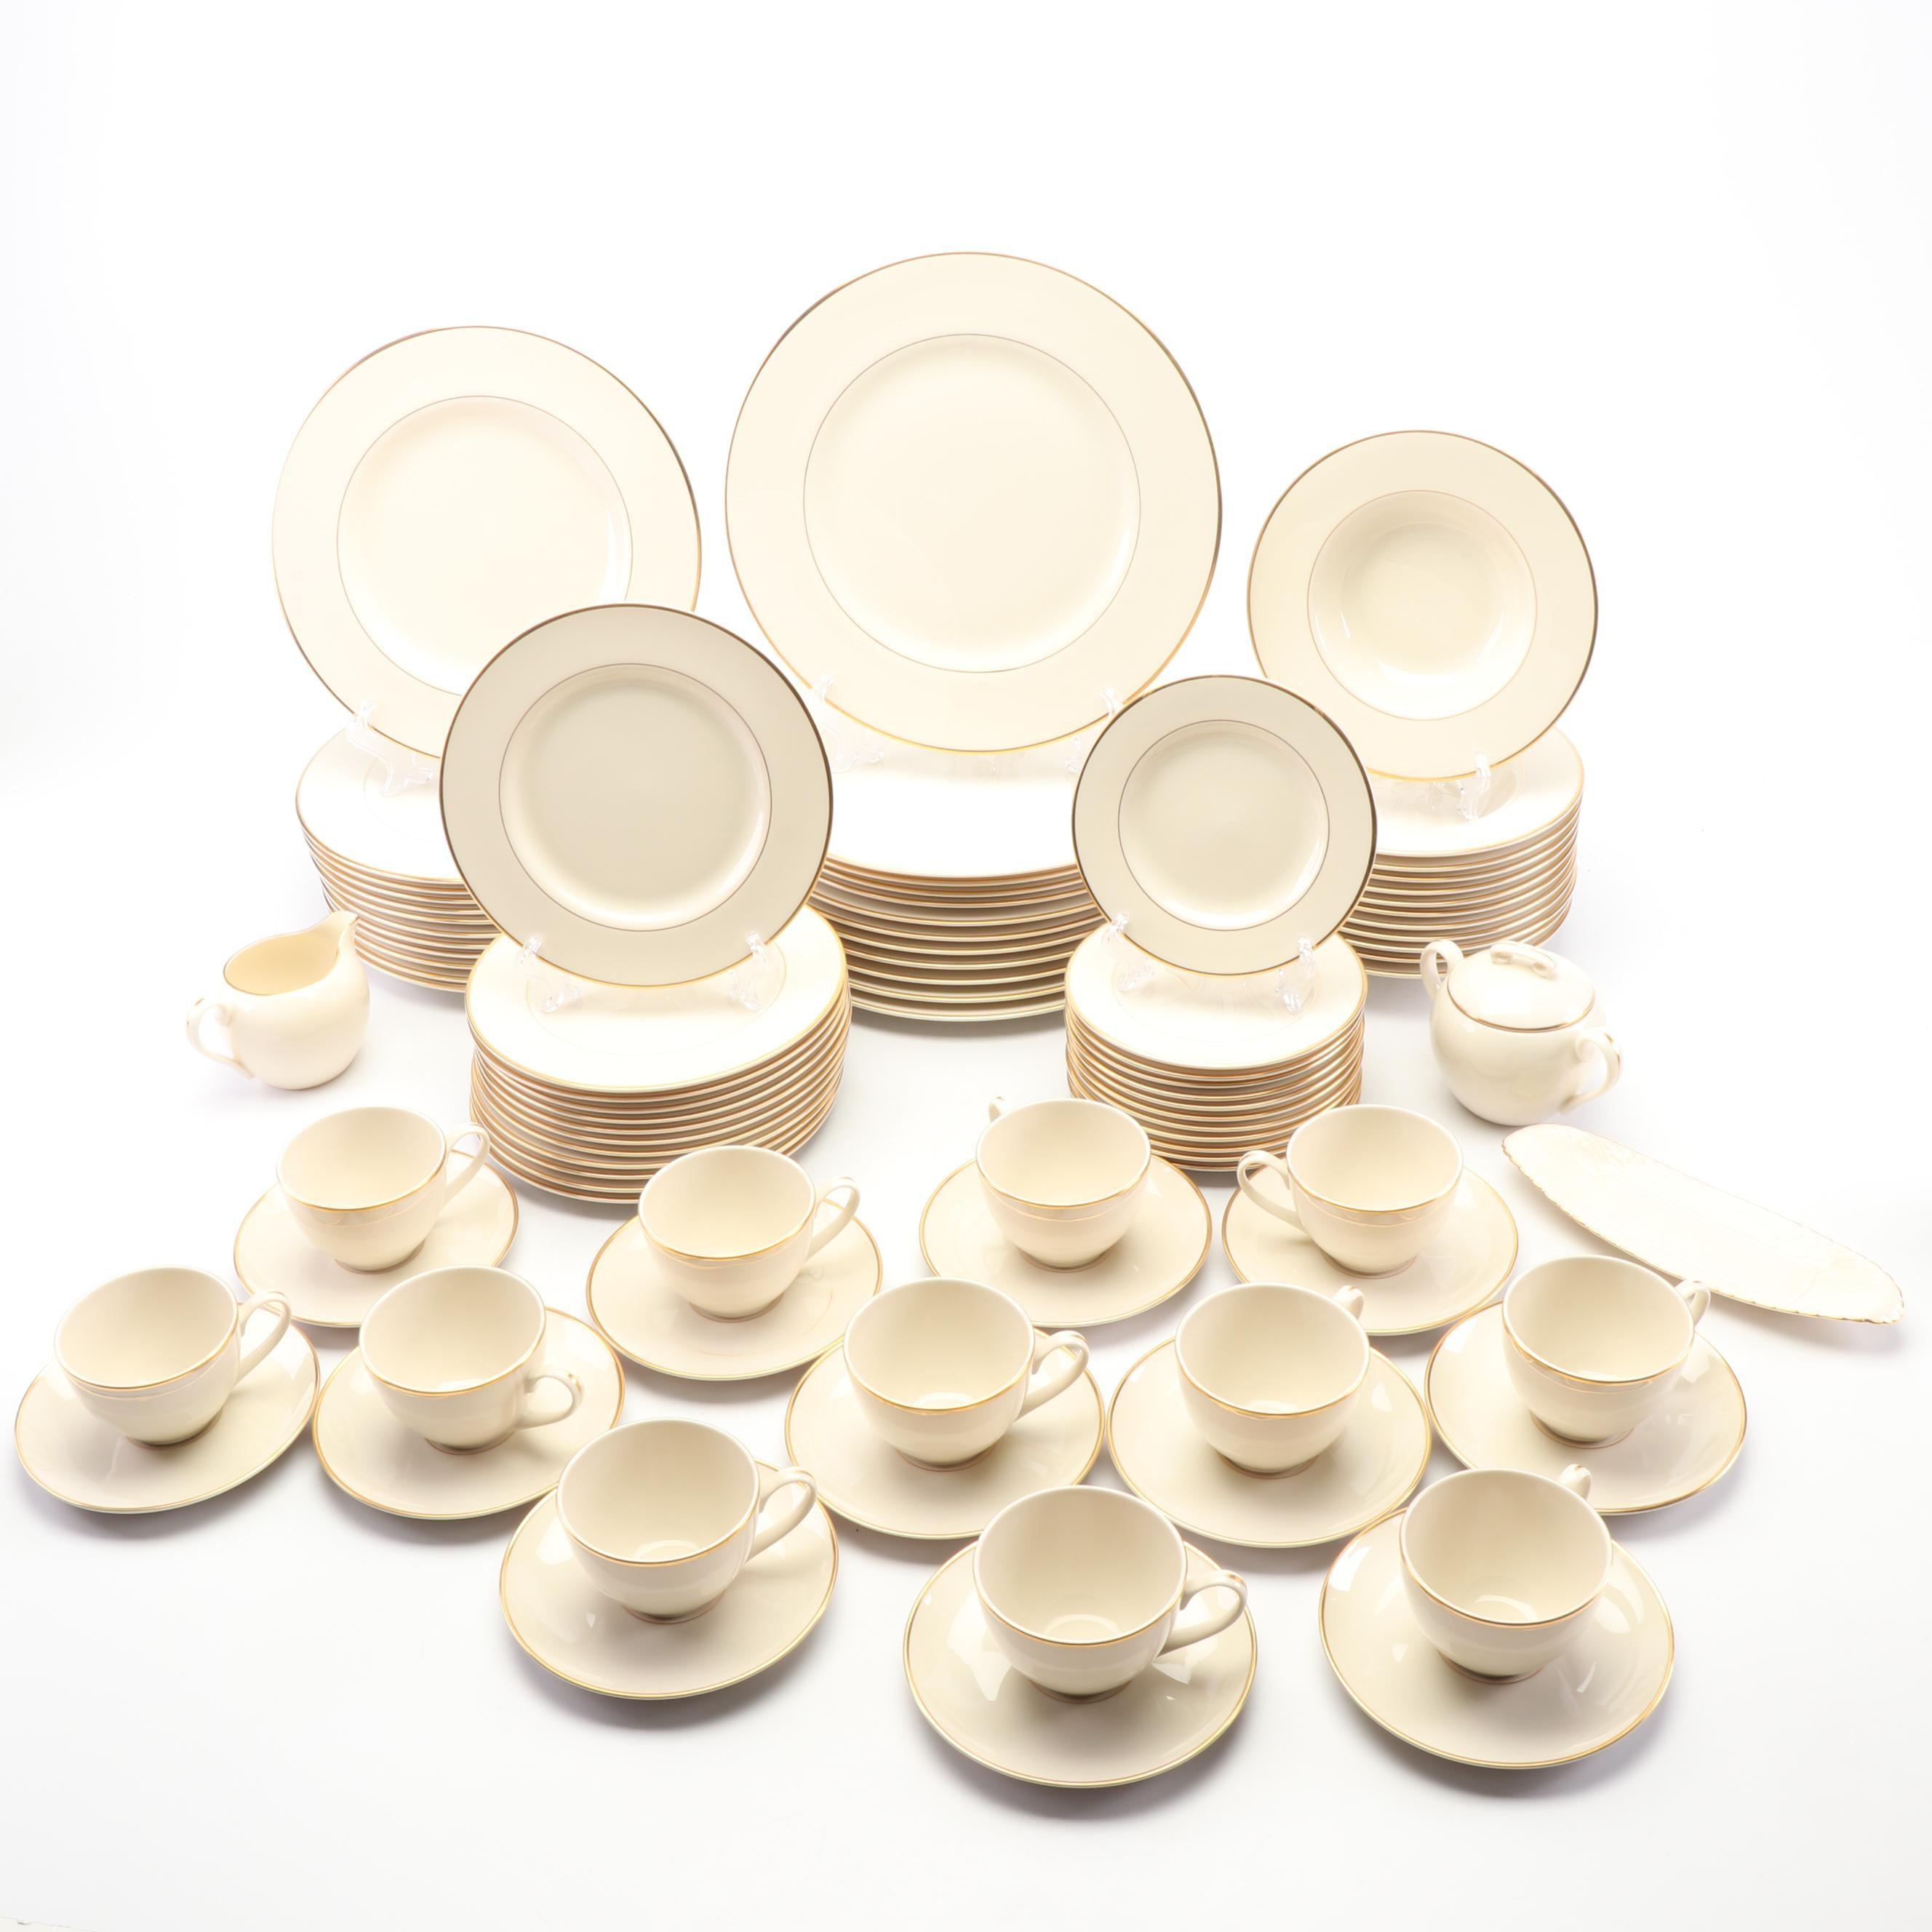 "Pickard Gilt Trimmed Bone China Dinnerware and Lenox ""Olympia"" Serveware"